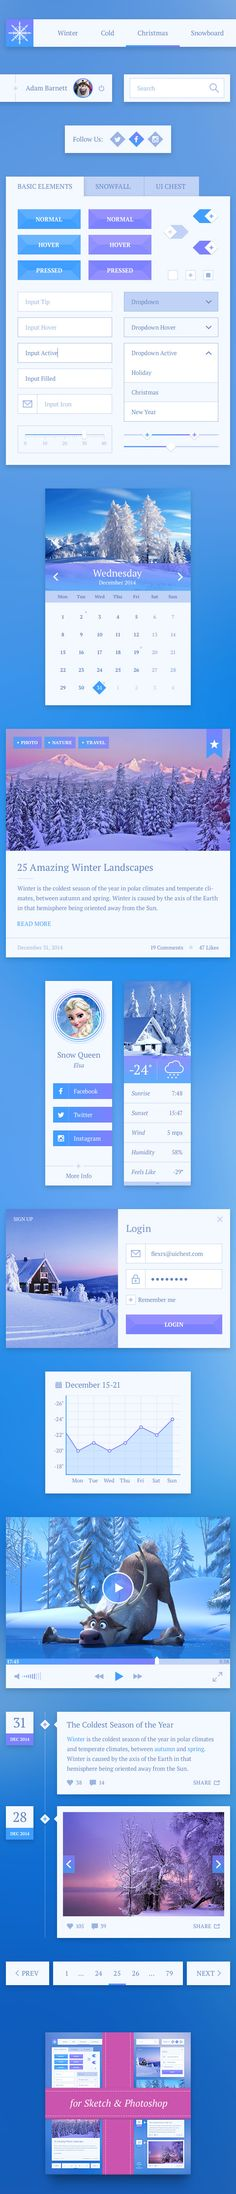 Snowflake UI Kit Free on Behance #UX/UI #Design